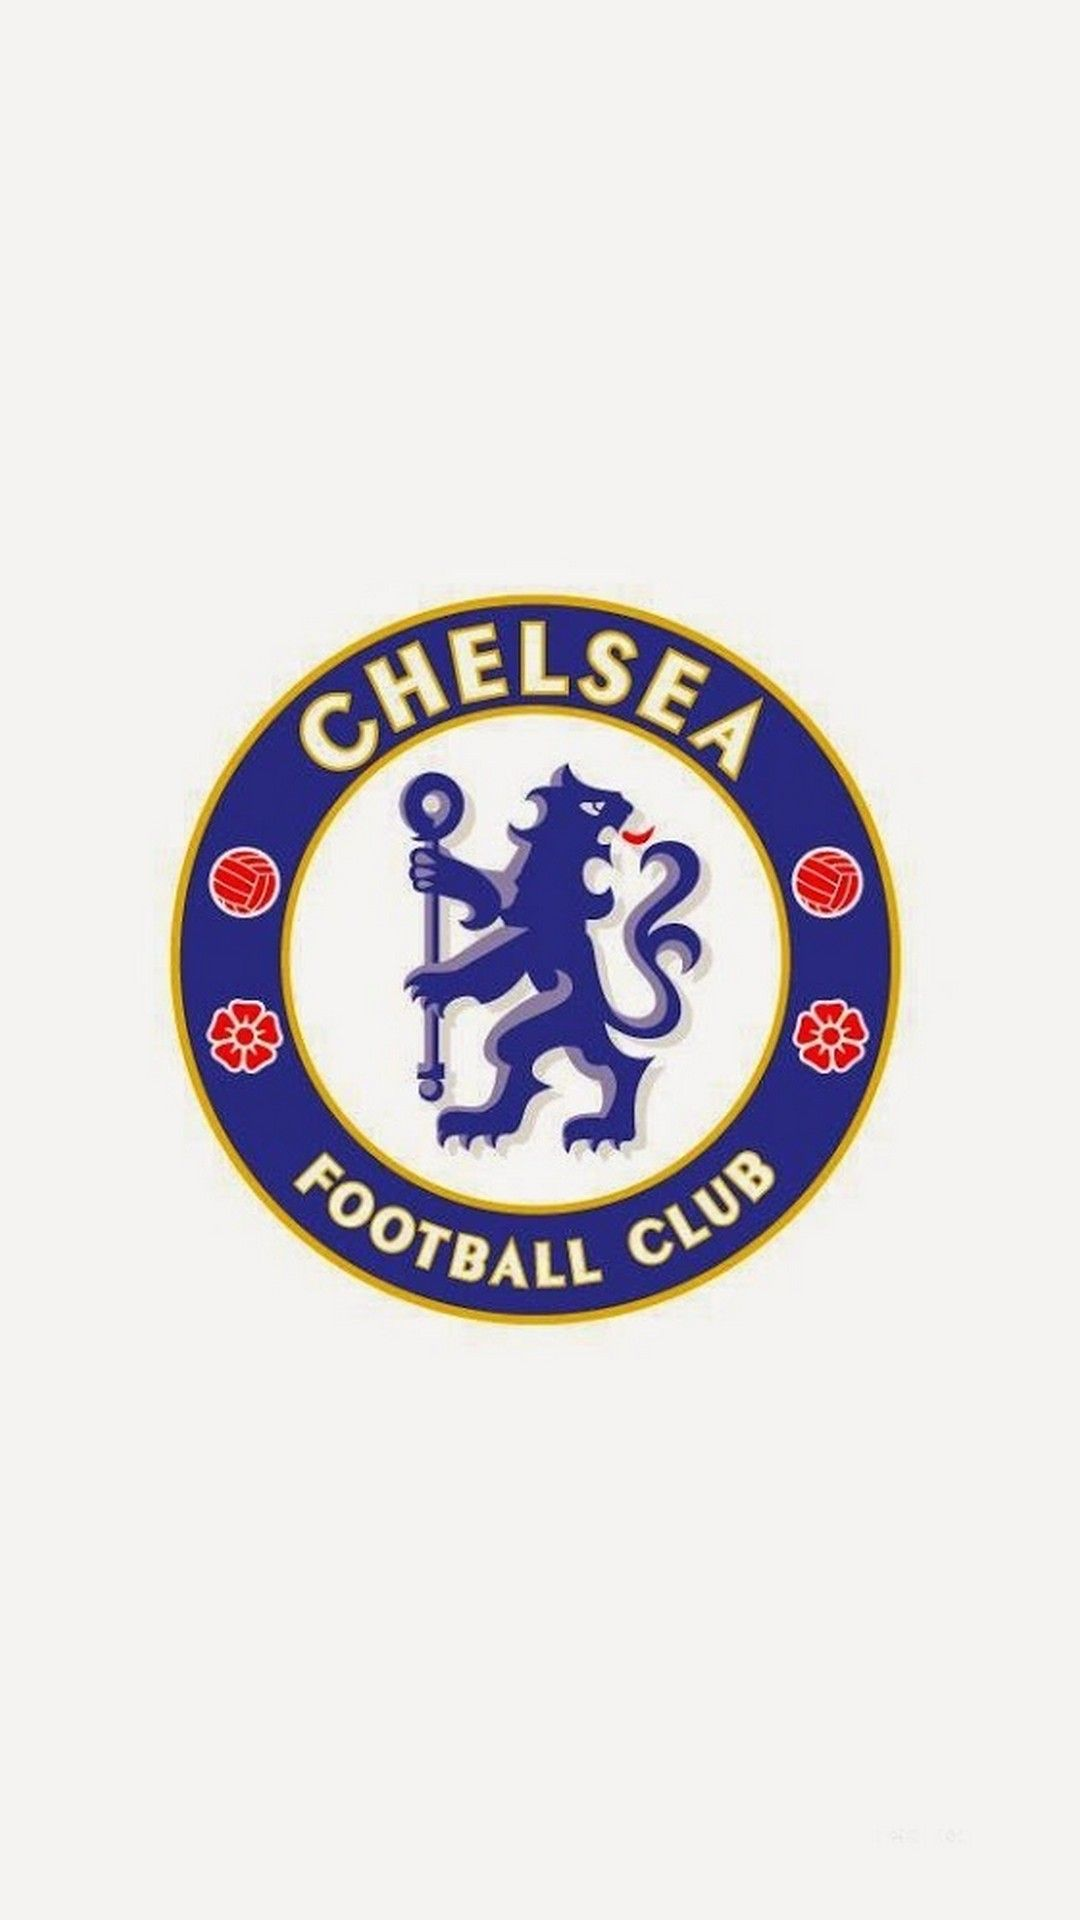 Chelsea Soccer Iphone X Wallpaper Best Wallpaper Hd Sepak Bola Entertainment Legenda